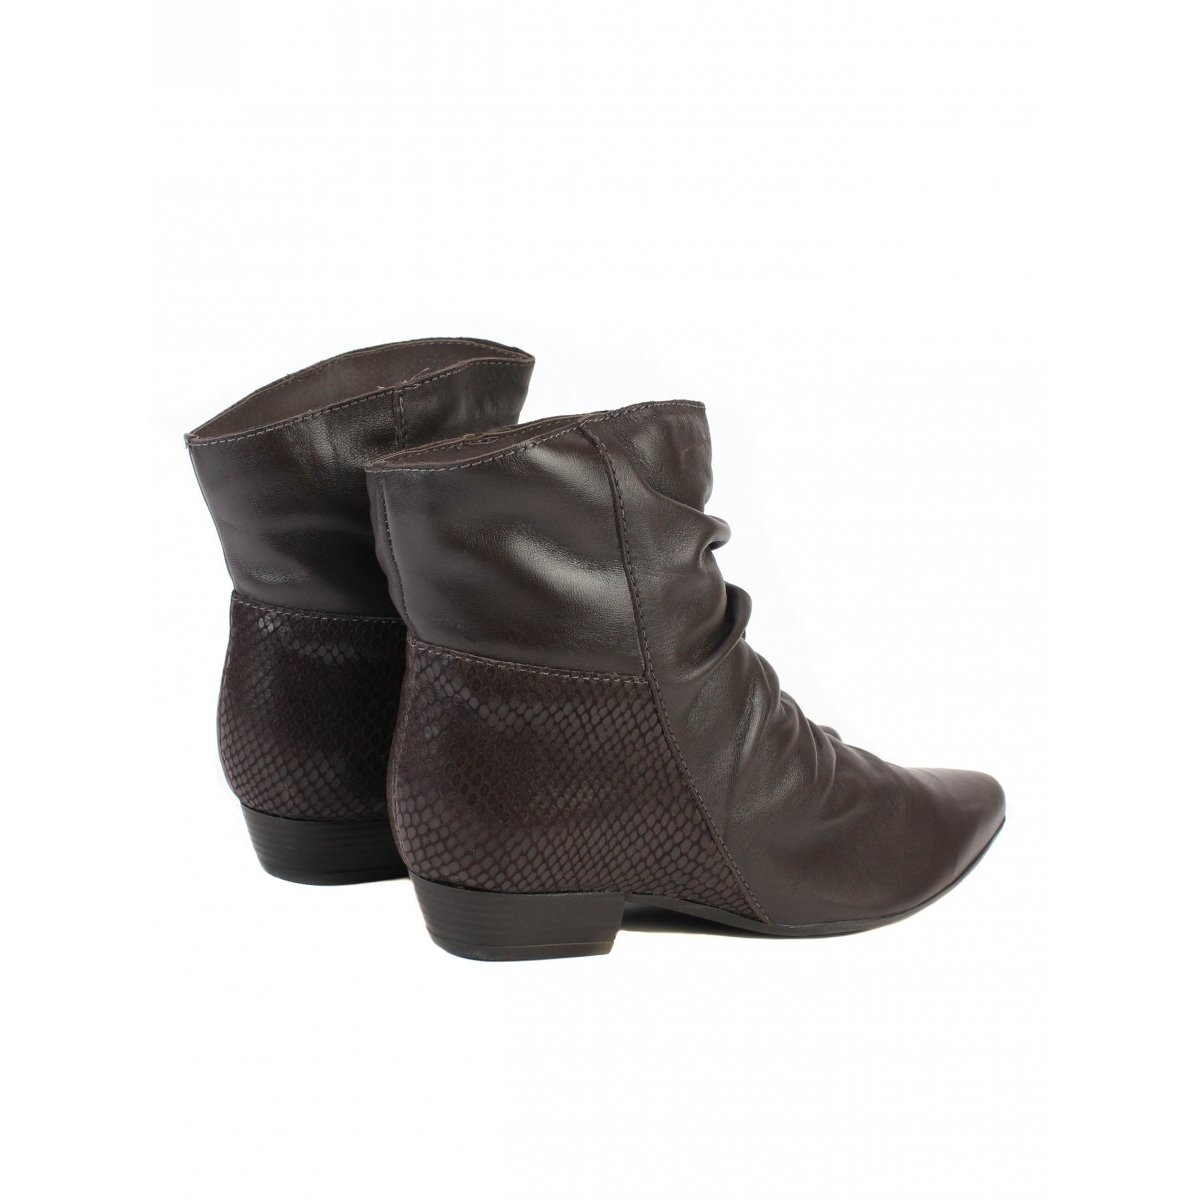 Boots Toscana Bota Bota Bottero Marrom Slouch Slouch wSzx8PBxq